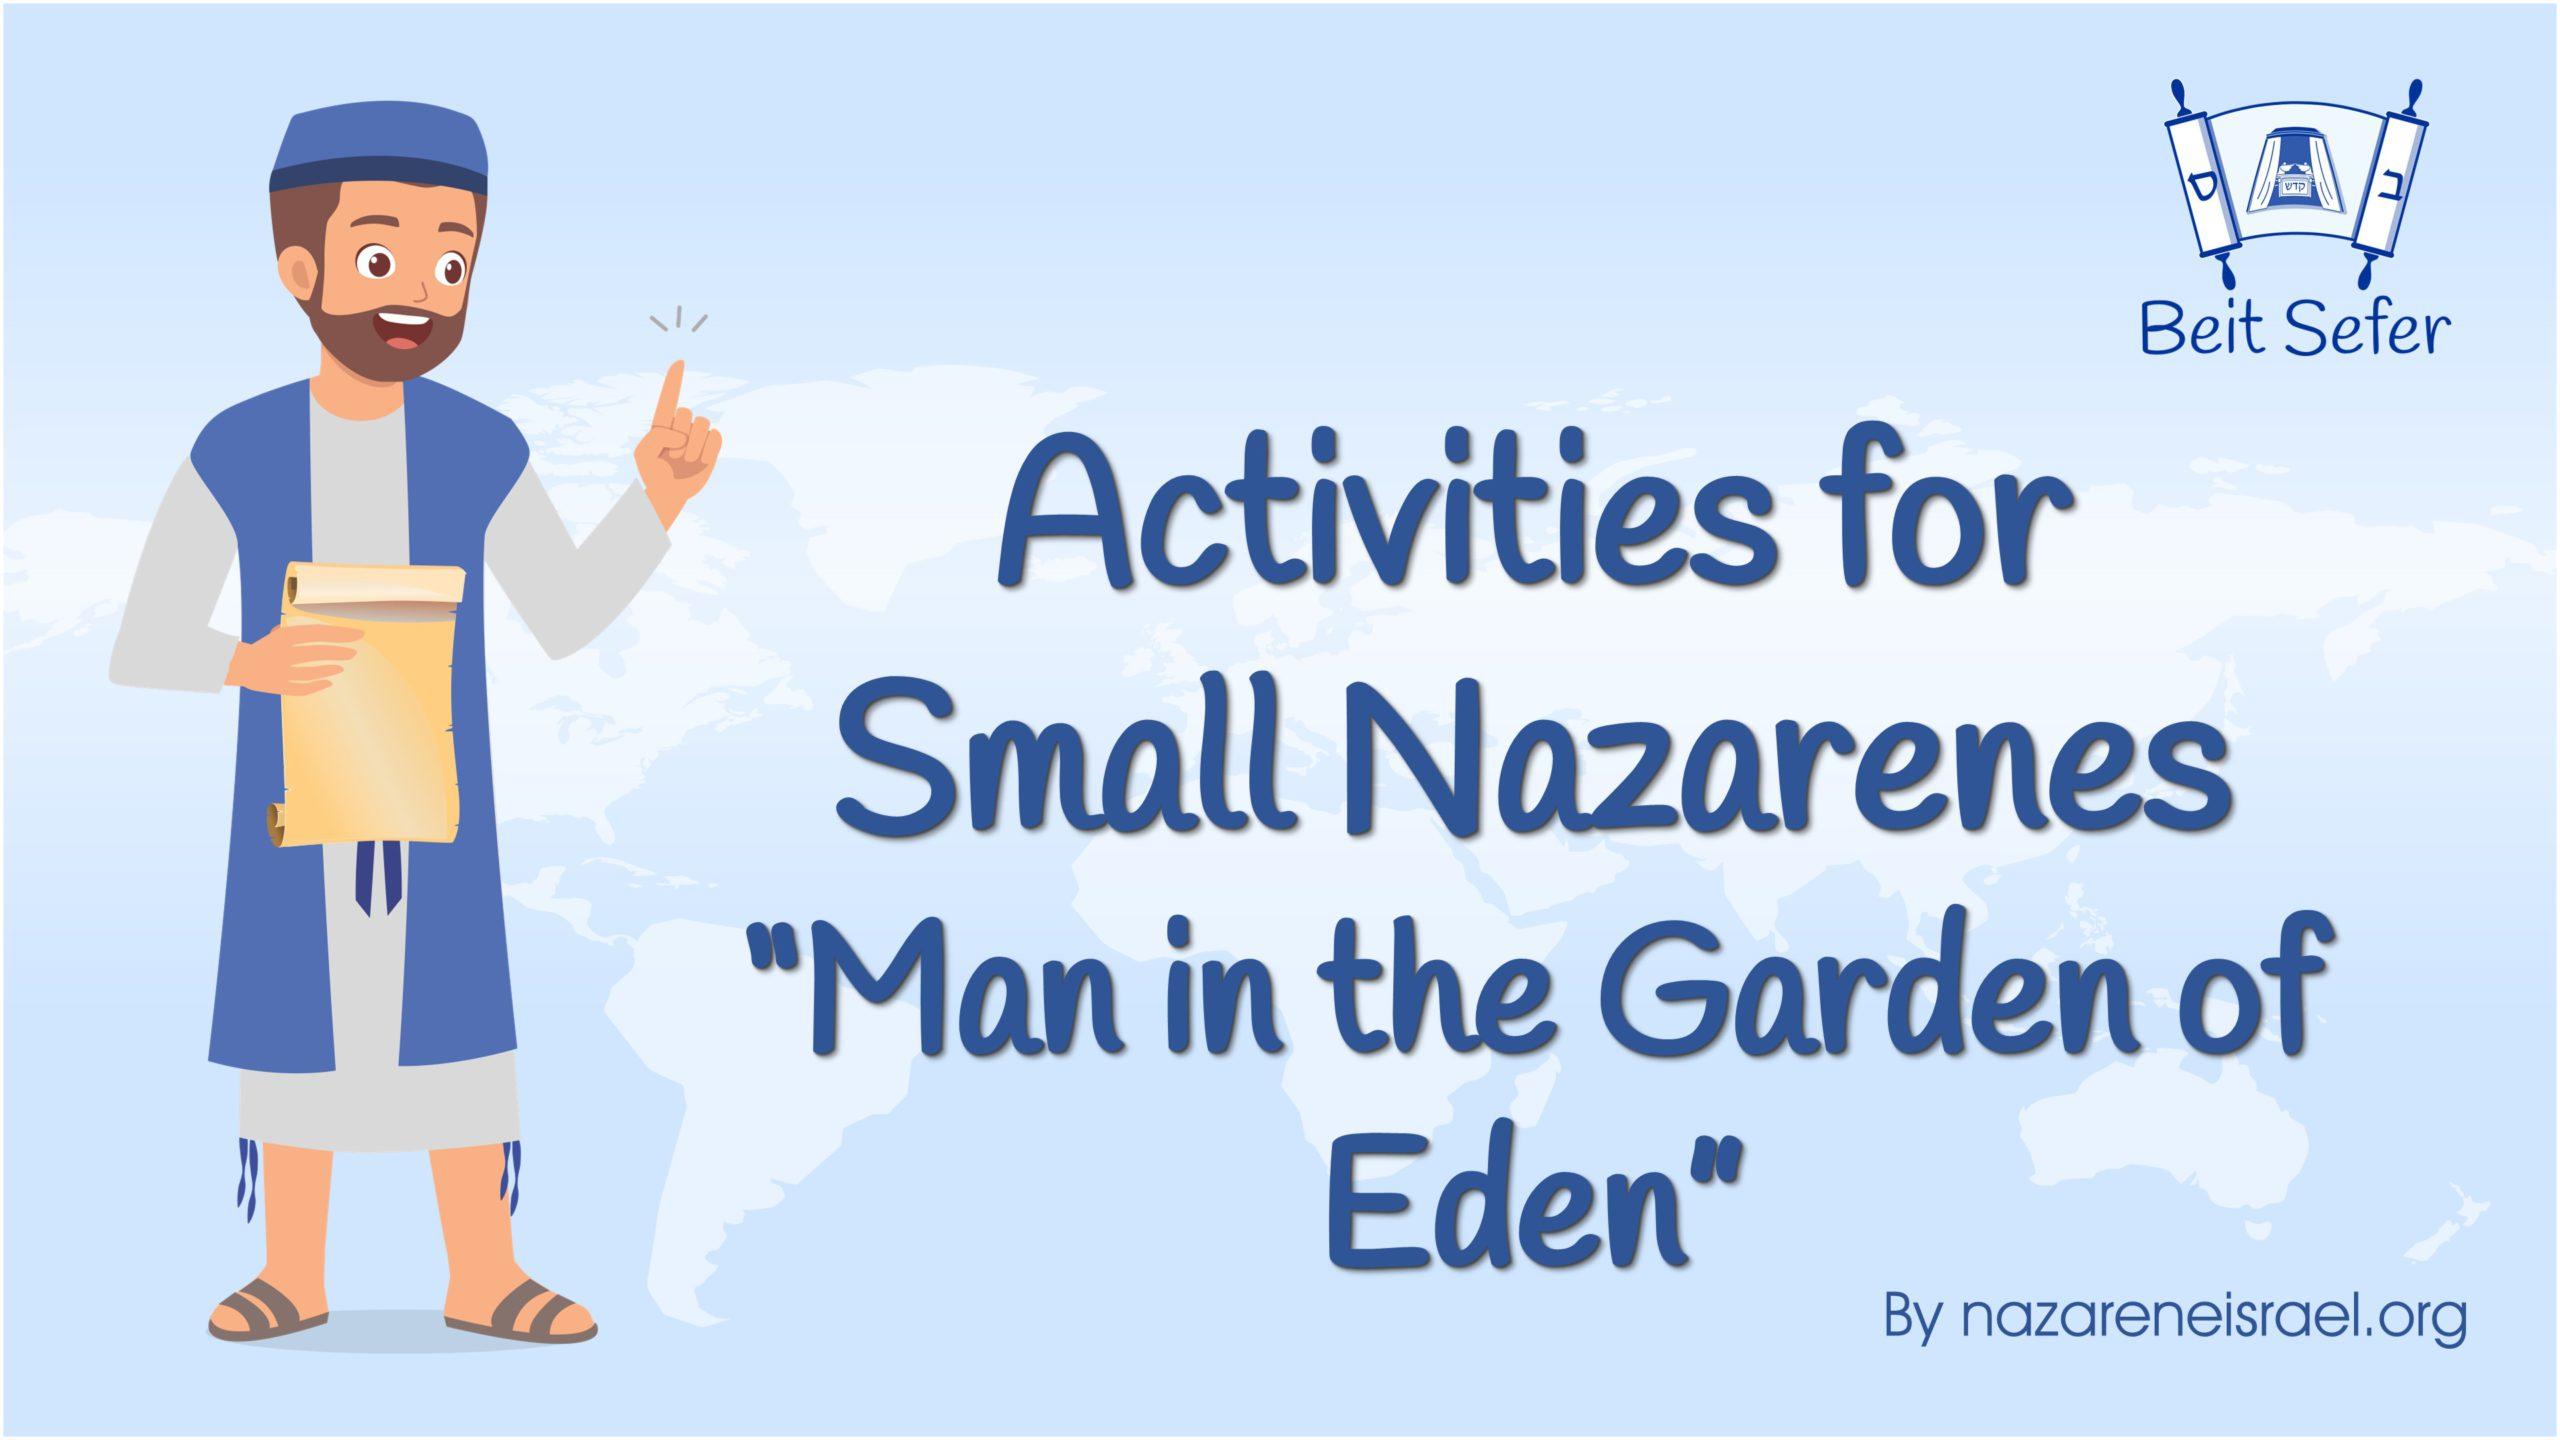 Man in the Garden of Eden